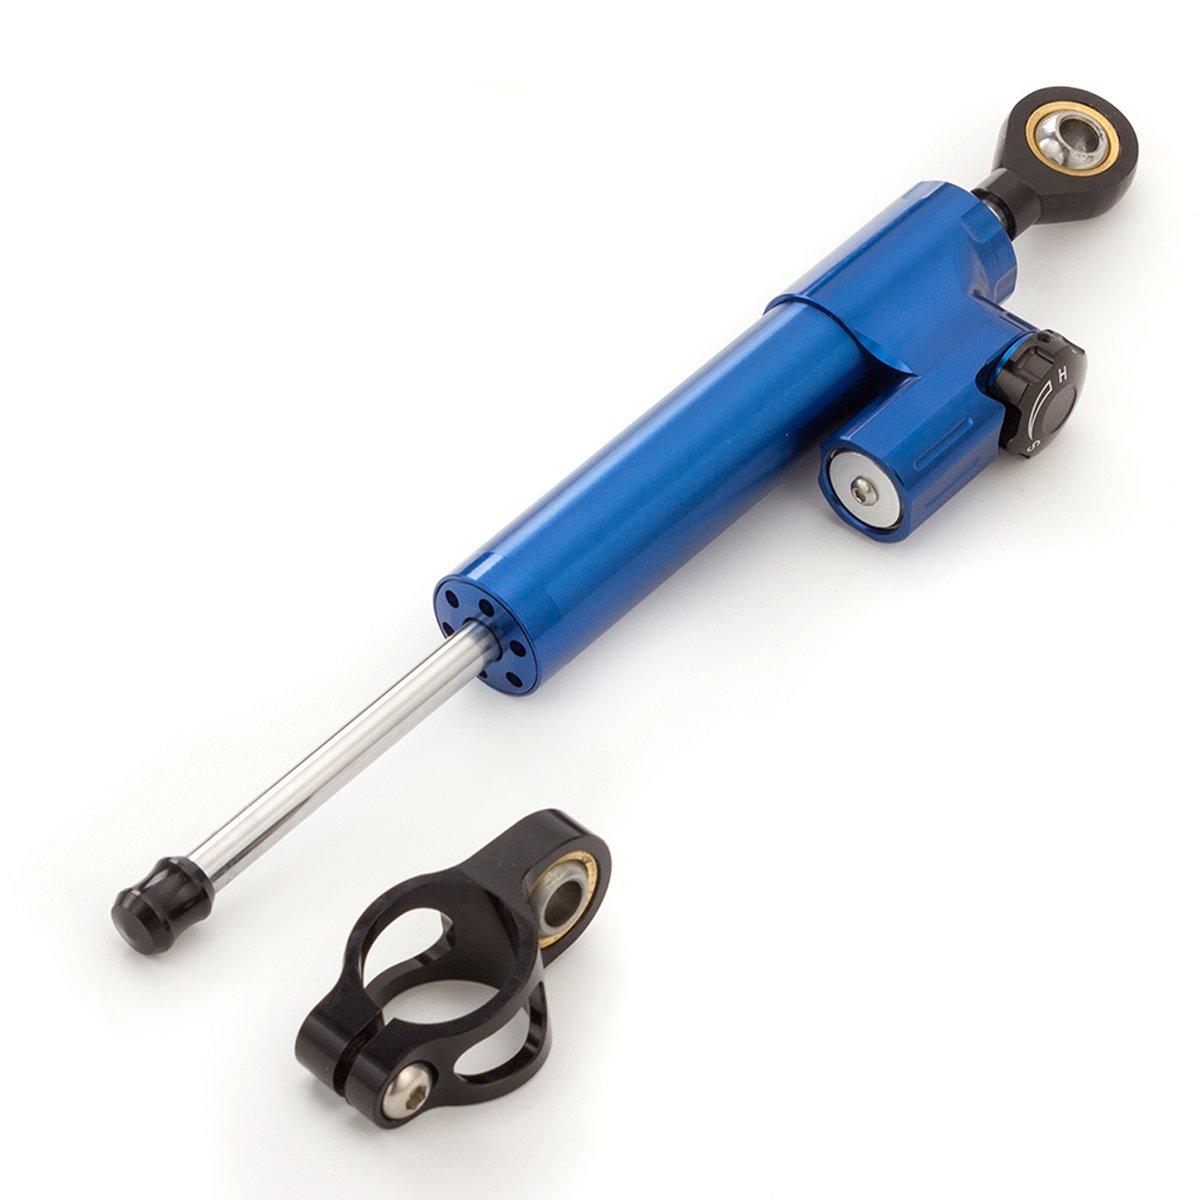 Motorcycle Adjustable Universal Steering Damper Stabilizer Control Fit For SUZUKI GSXR 1000 750 K4 KAWASAKI ZX636 ZX6R HONDA CB1000R KTM DUKE125 YAMAHA YZF R6 MT-09 XJR1300 (blue+black)